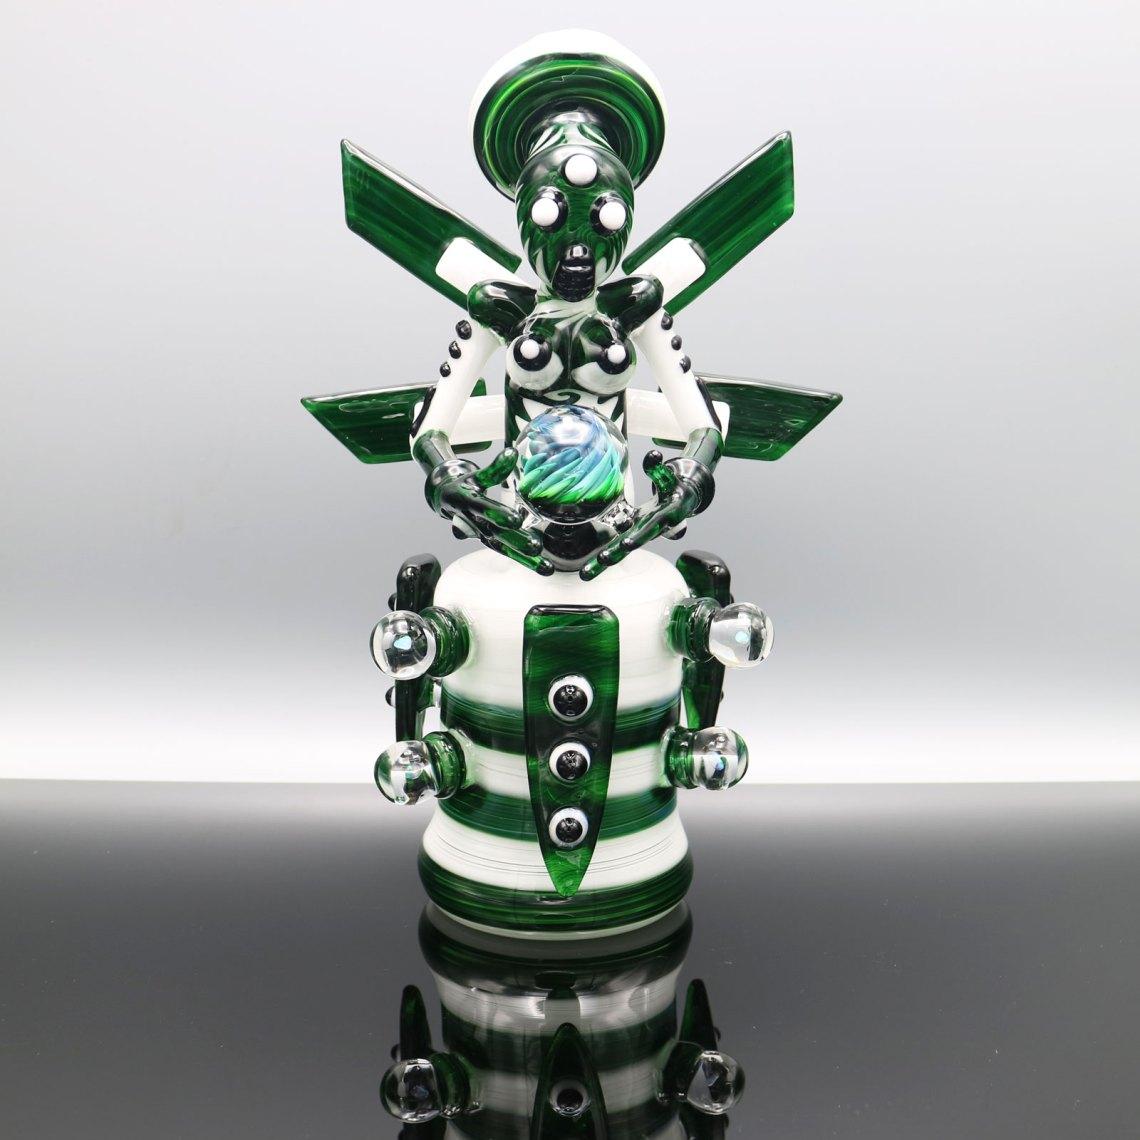 Kiebler – Experimental Green and Star White Functional Mech Set